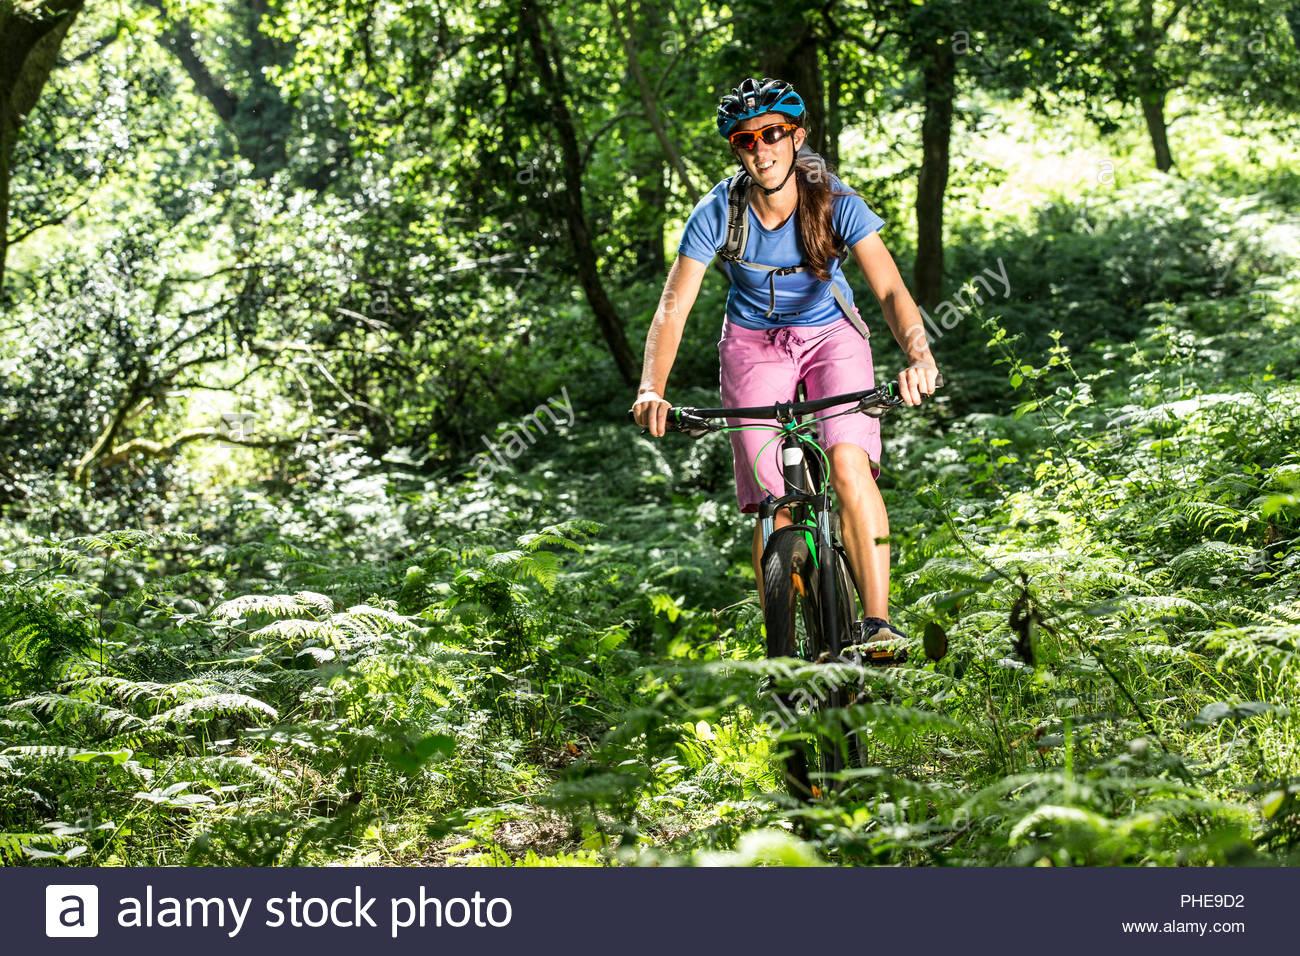 Woman mountain biking in forest - Stock Image